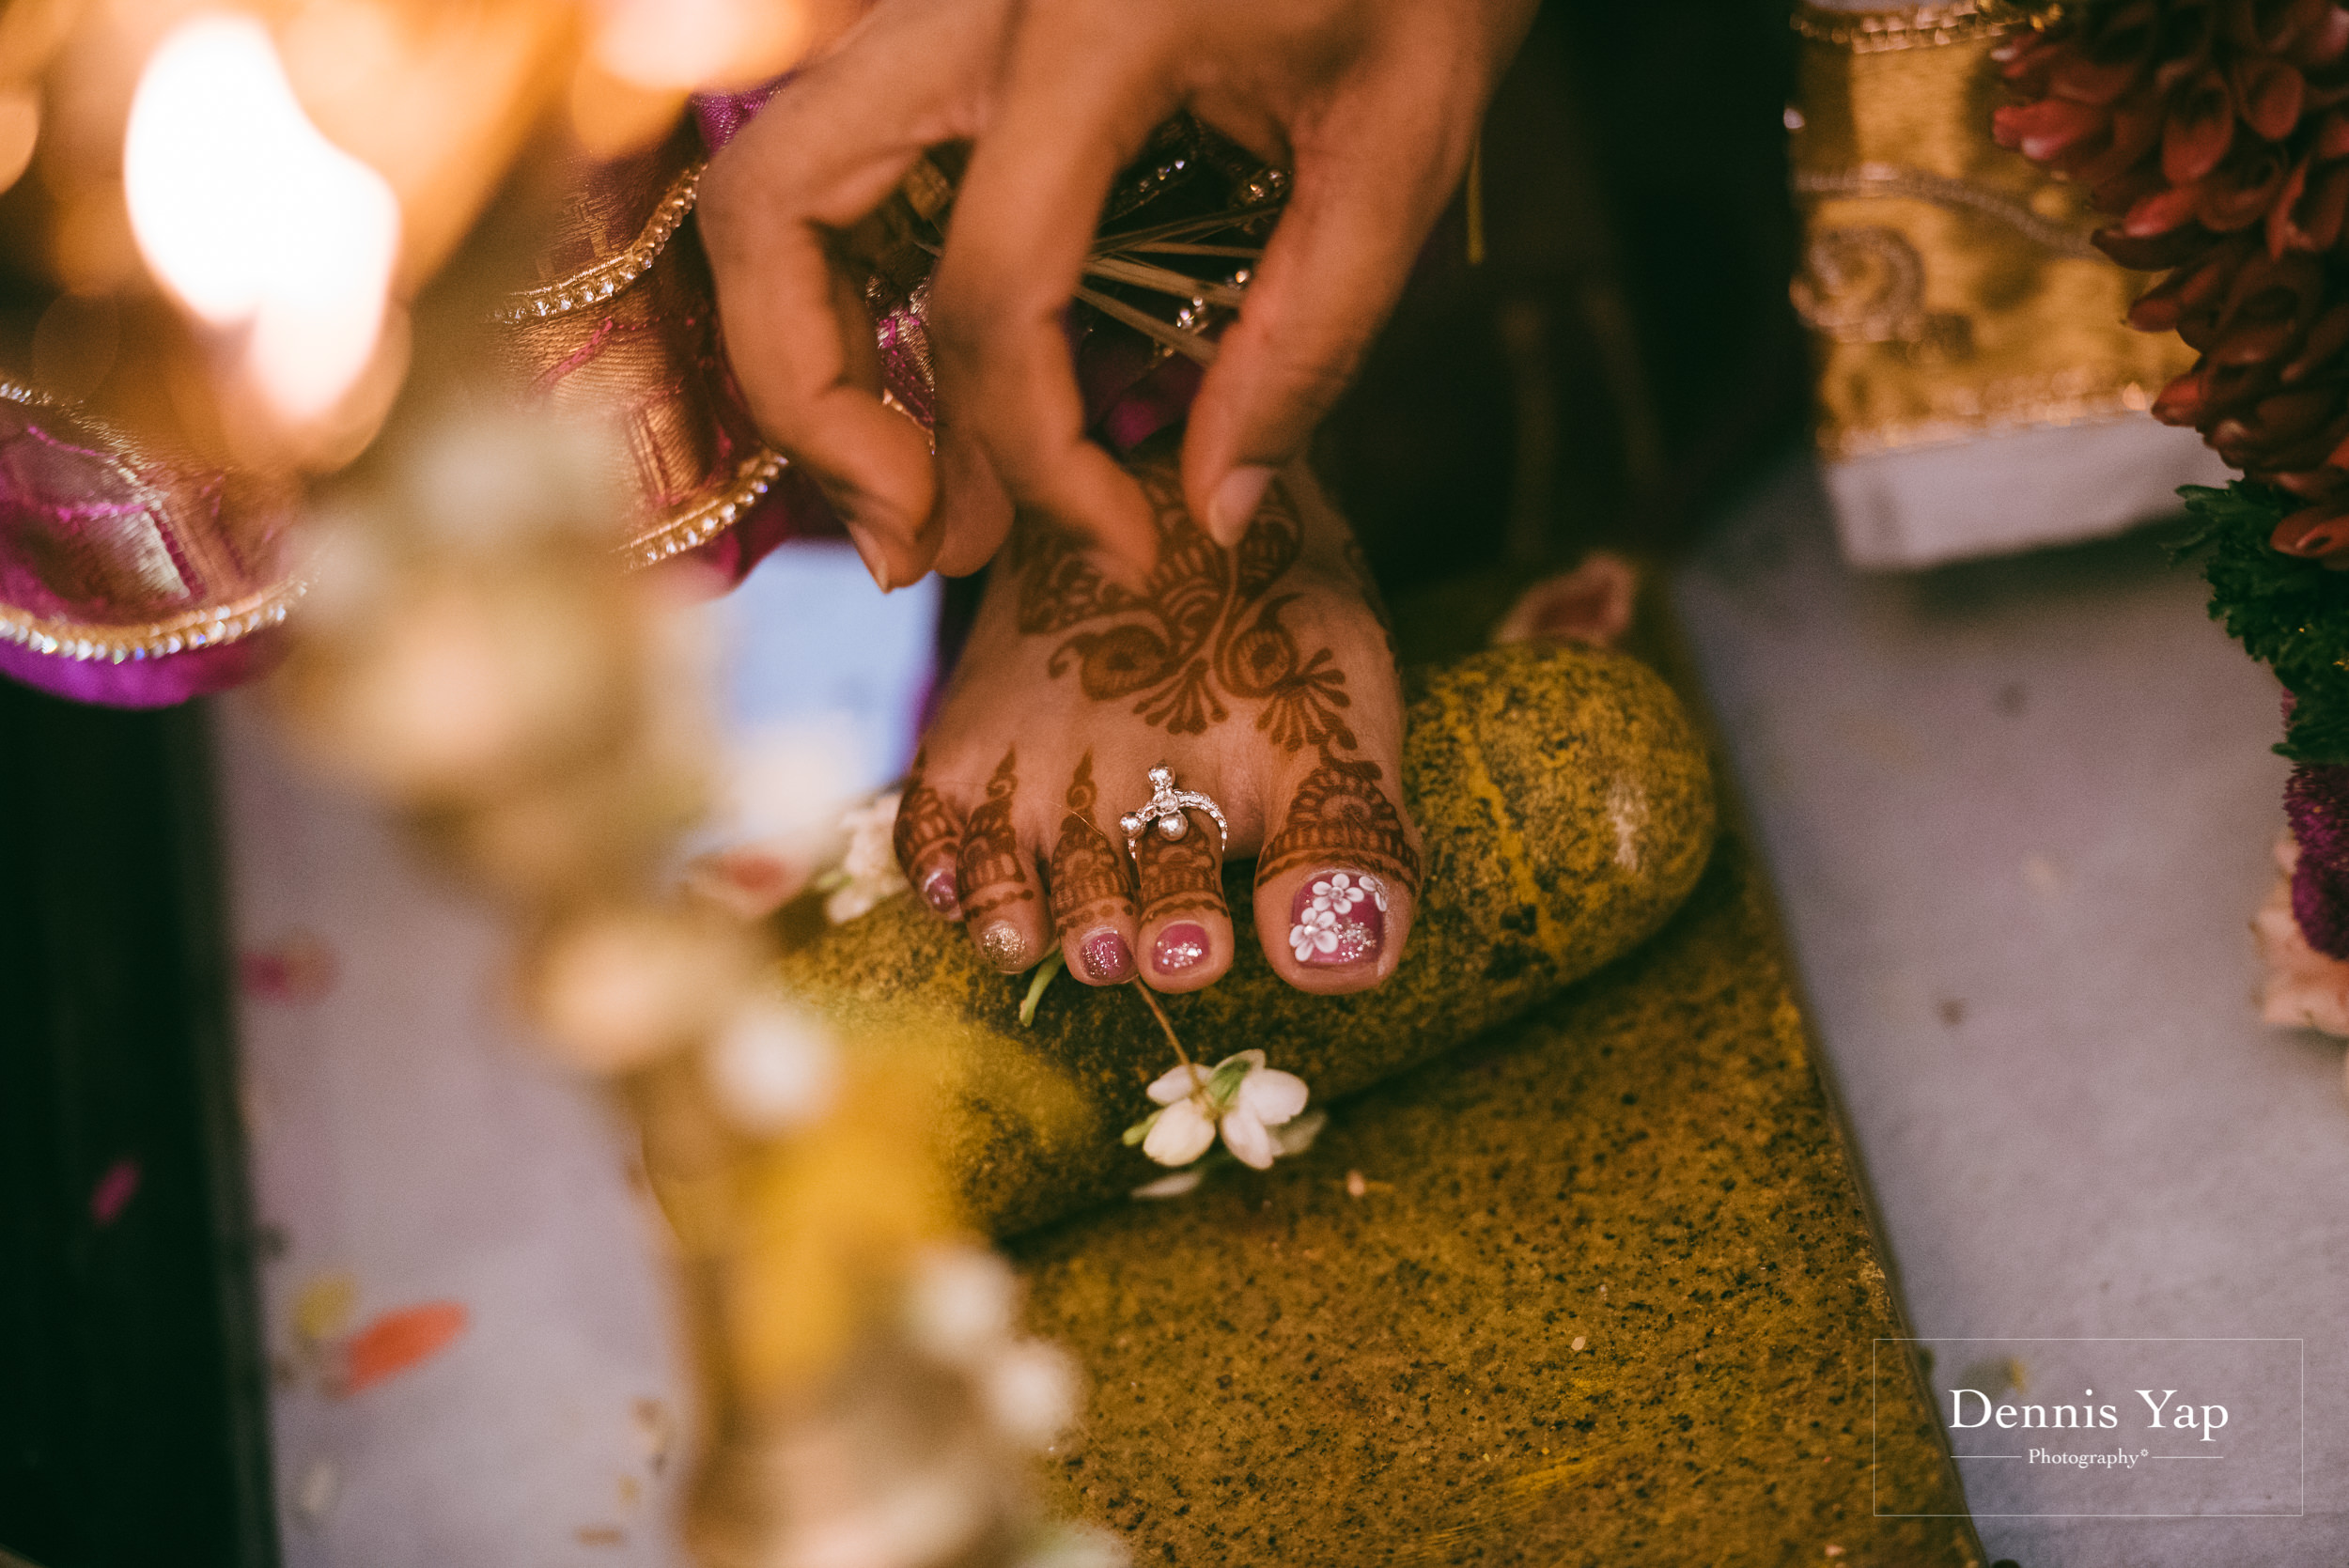 puvaneswaran cangitaa indian wedding ceremony ideal convention dennis yap photography malaysia-30.jpg